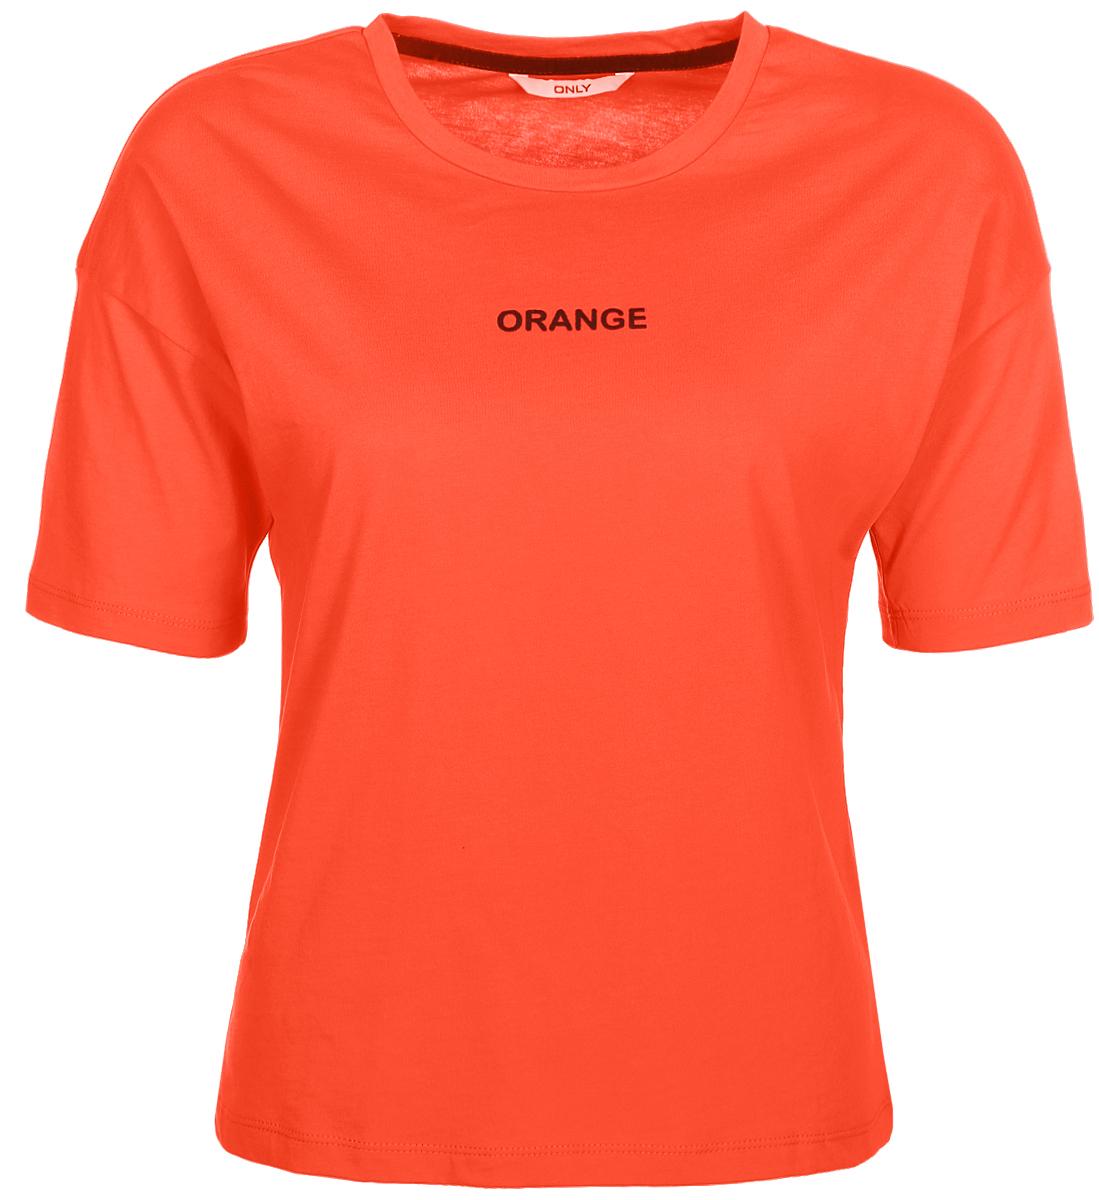 Футболка женская Only, цвет: оранжевый. 15150344_Orangeade. Размер 42/44 only